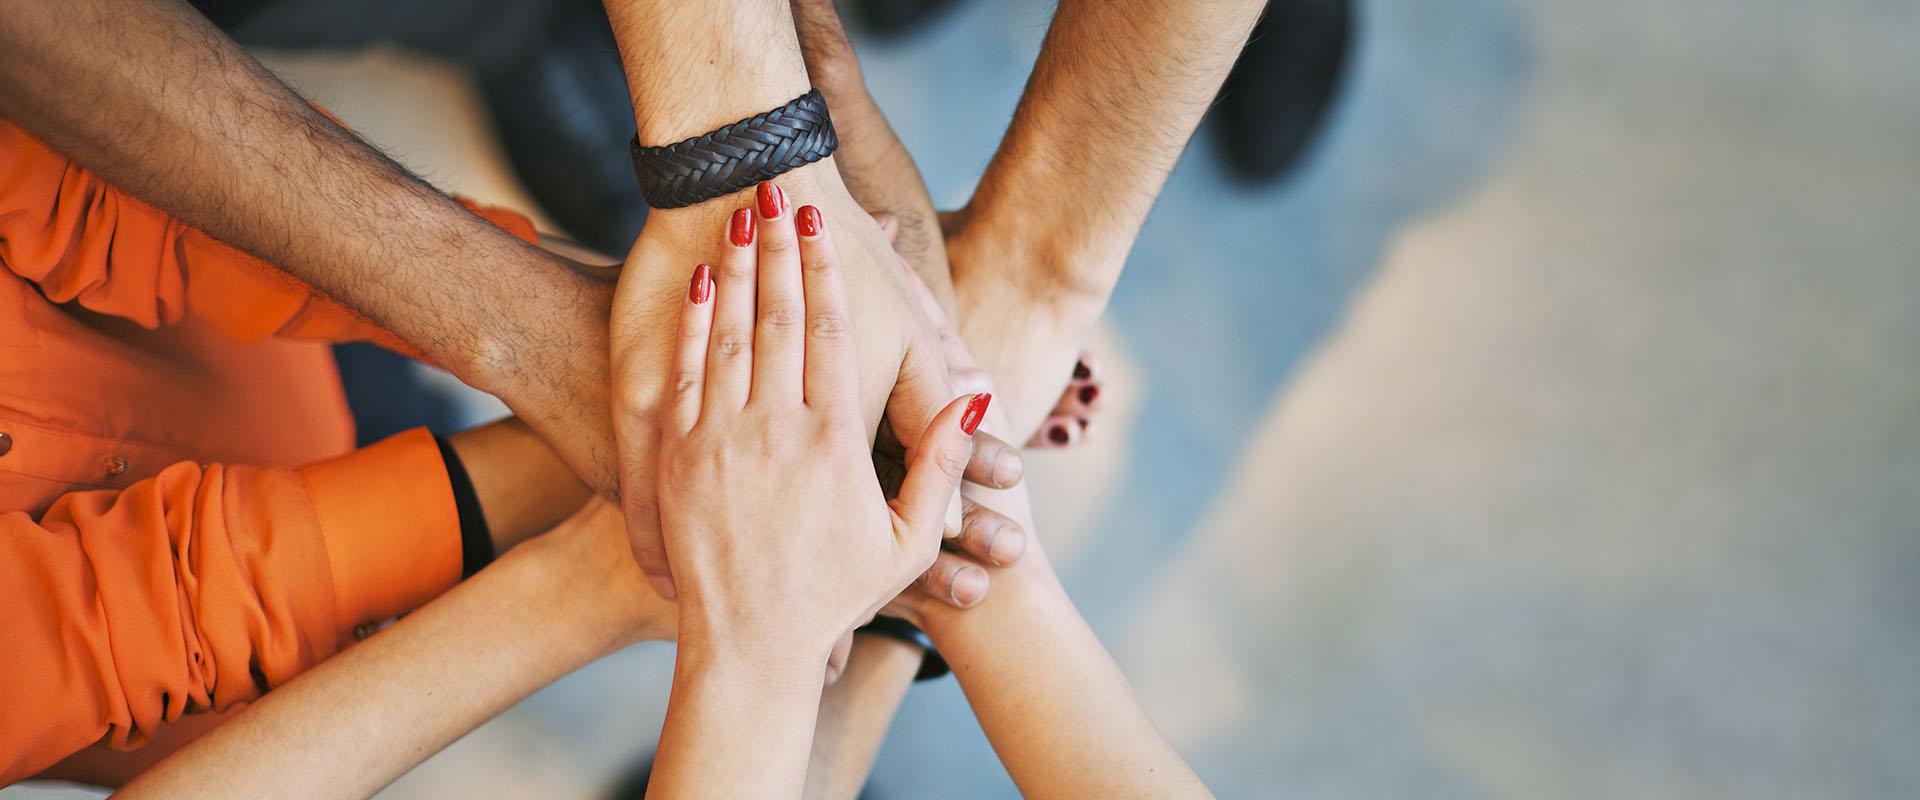 teamwork-photo-cropped